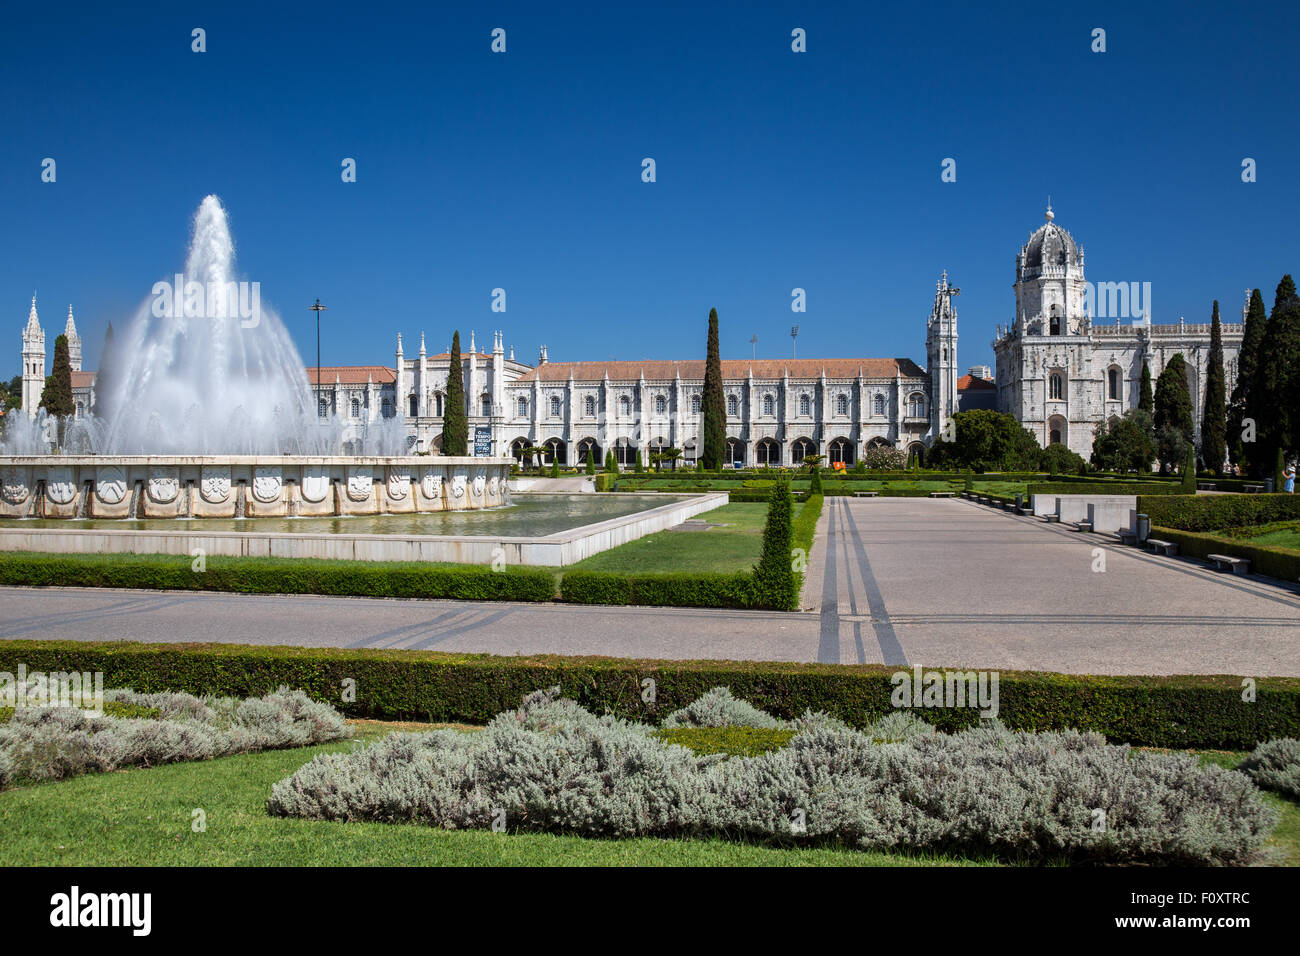 Mosteiro dos Jerónimos, the monastery at Belem, Lisbon, Portugal - Stock Image